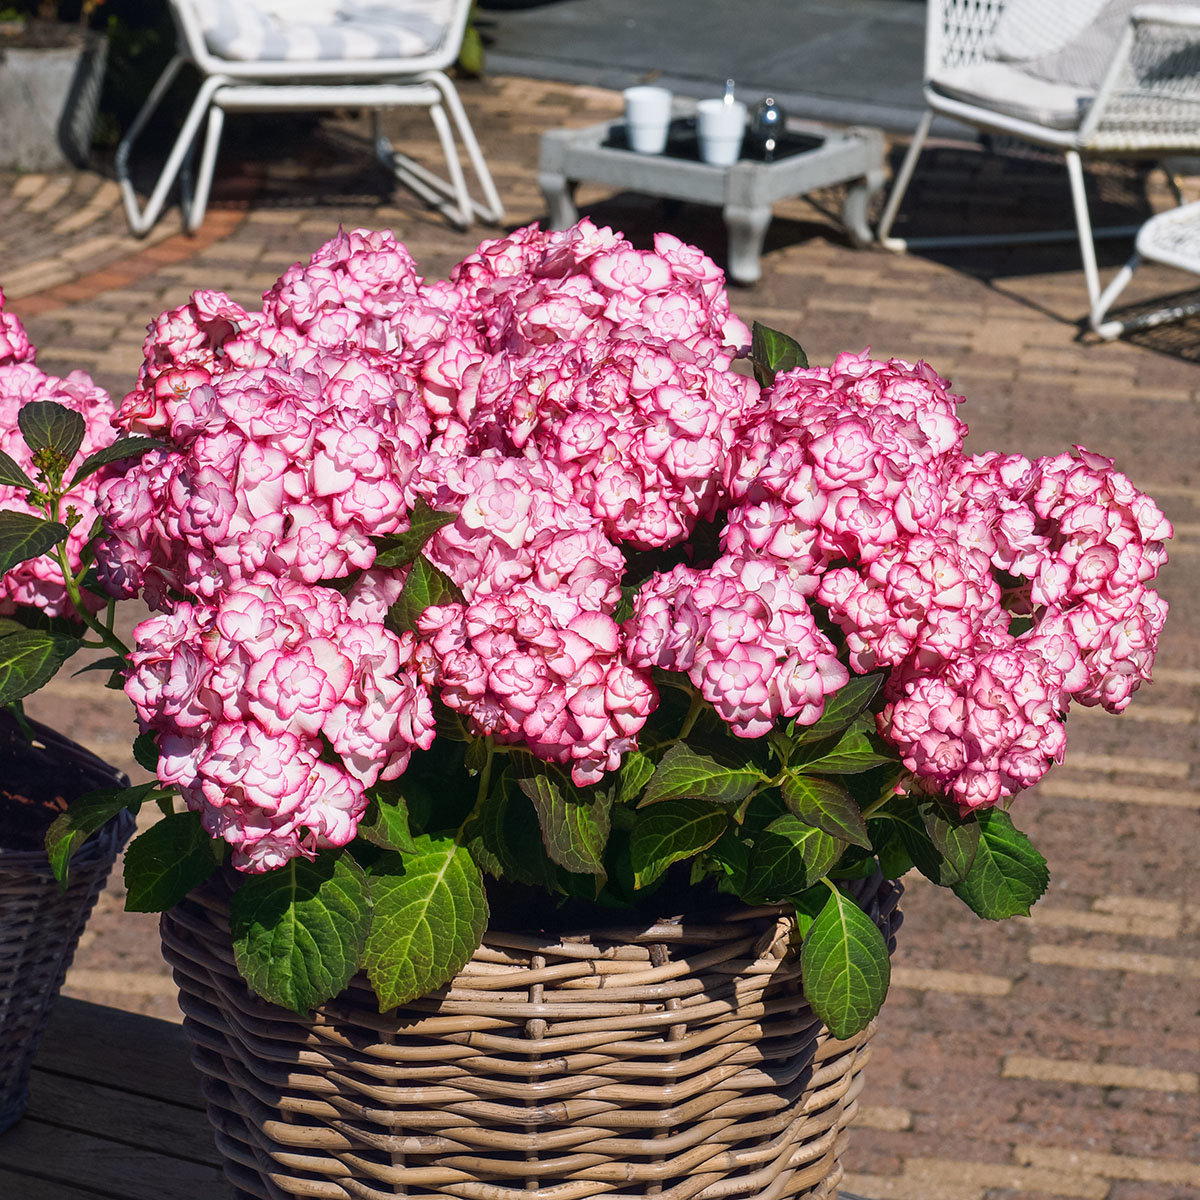 Garten-Hortensie Miss Saori, rosa, im ca. 15 cm-Topf